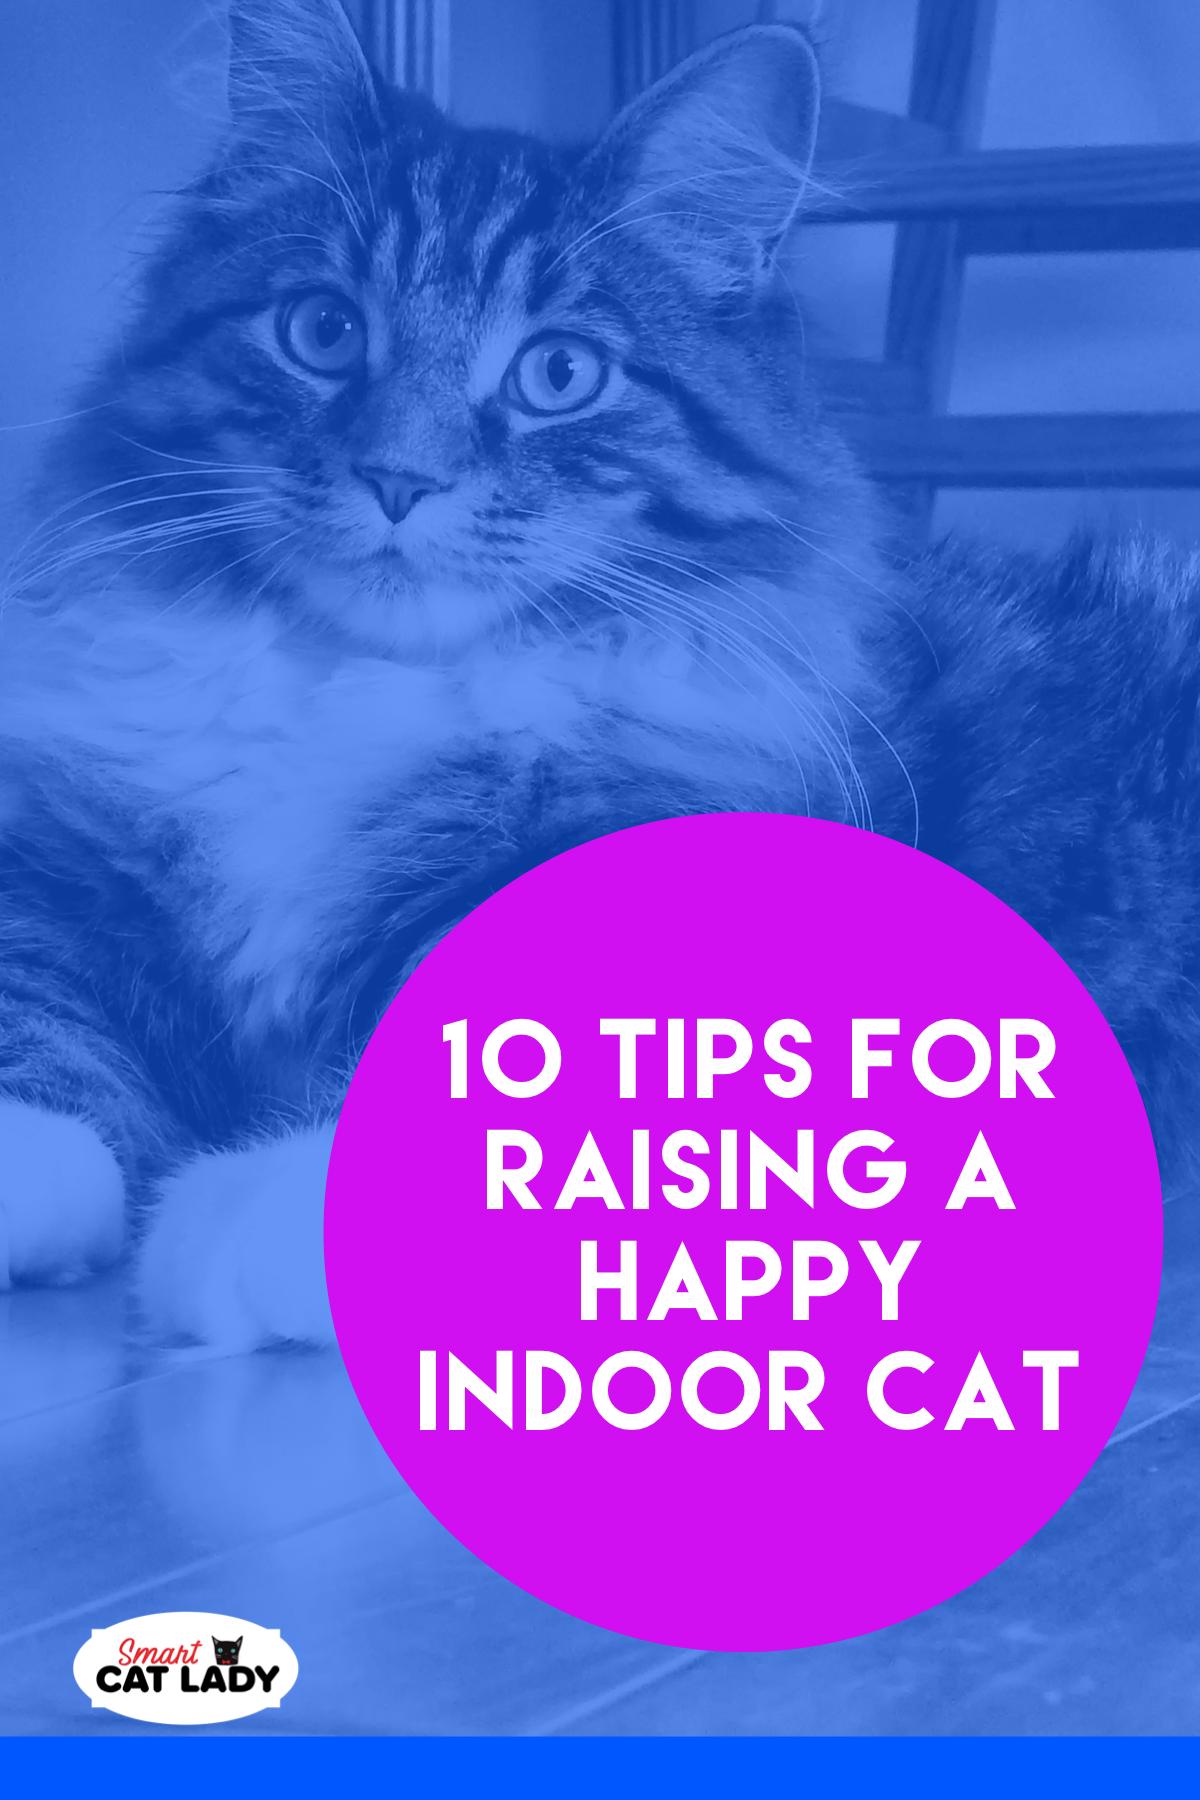 10 Tips For A Happy Indoor Cat Indoor Cat Cats Cat Care